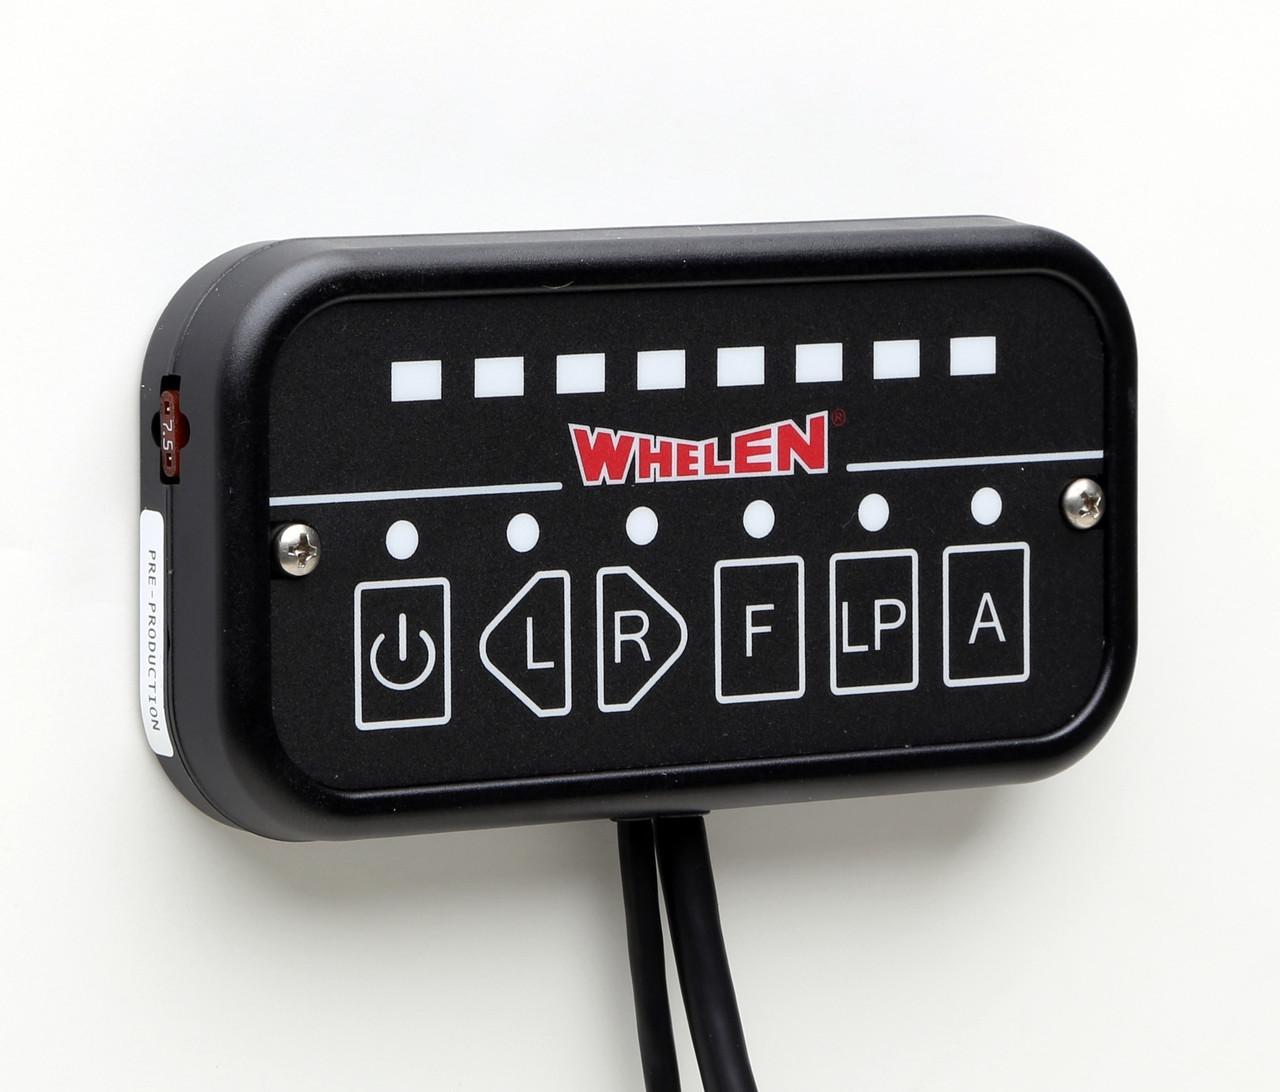 Whelen Arrow Stick Traffic Advisor LED TAC8 and Control Head